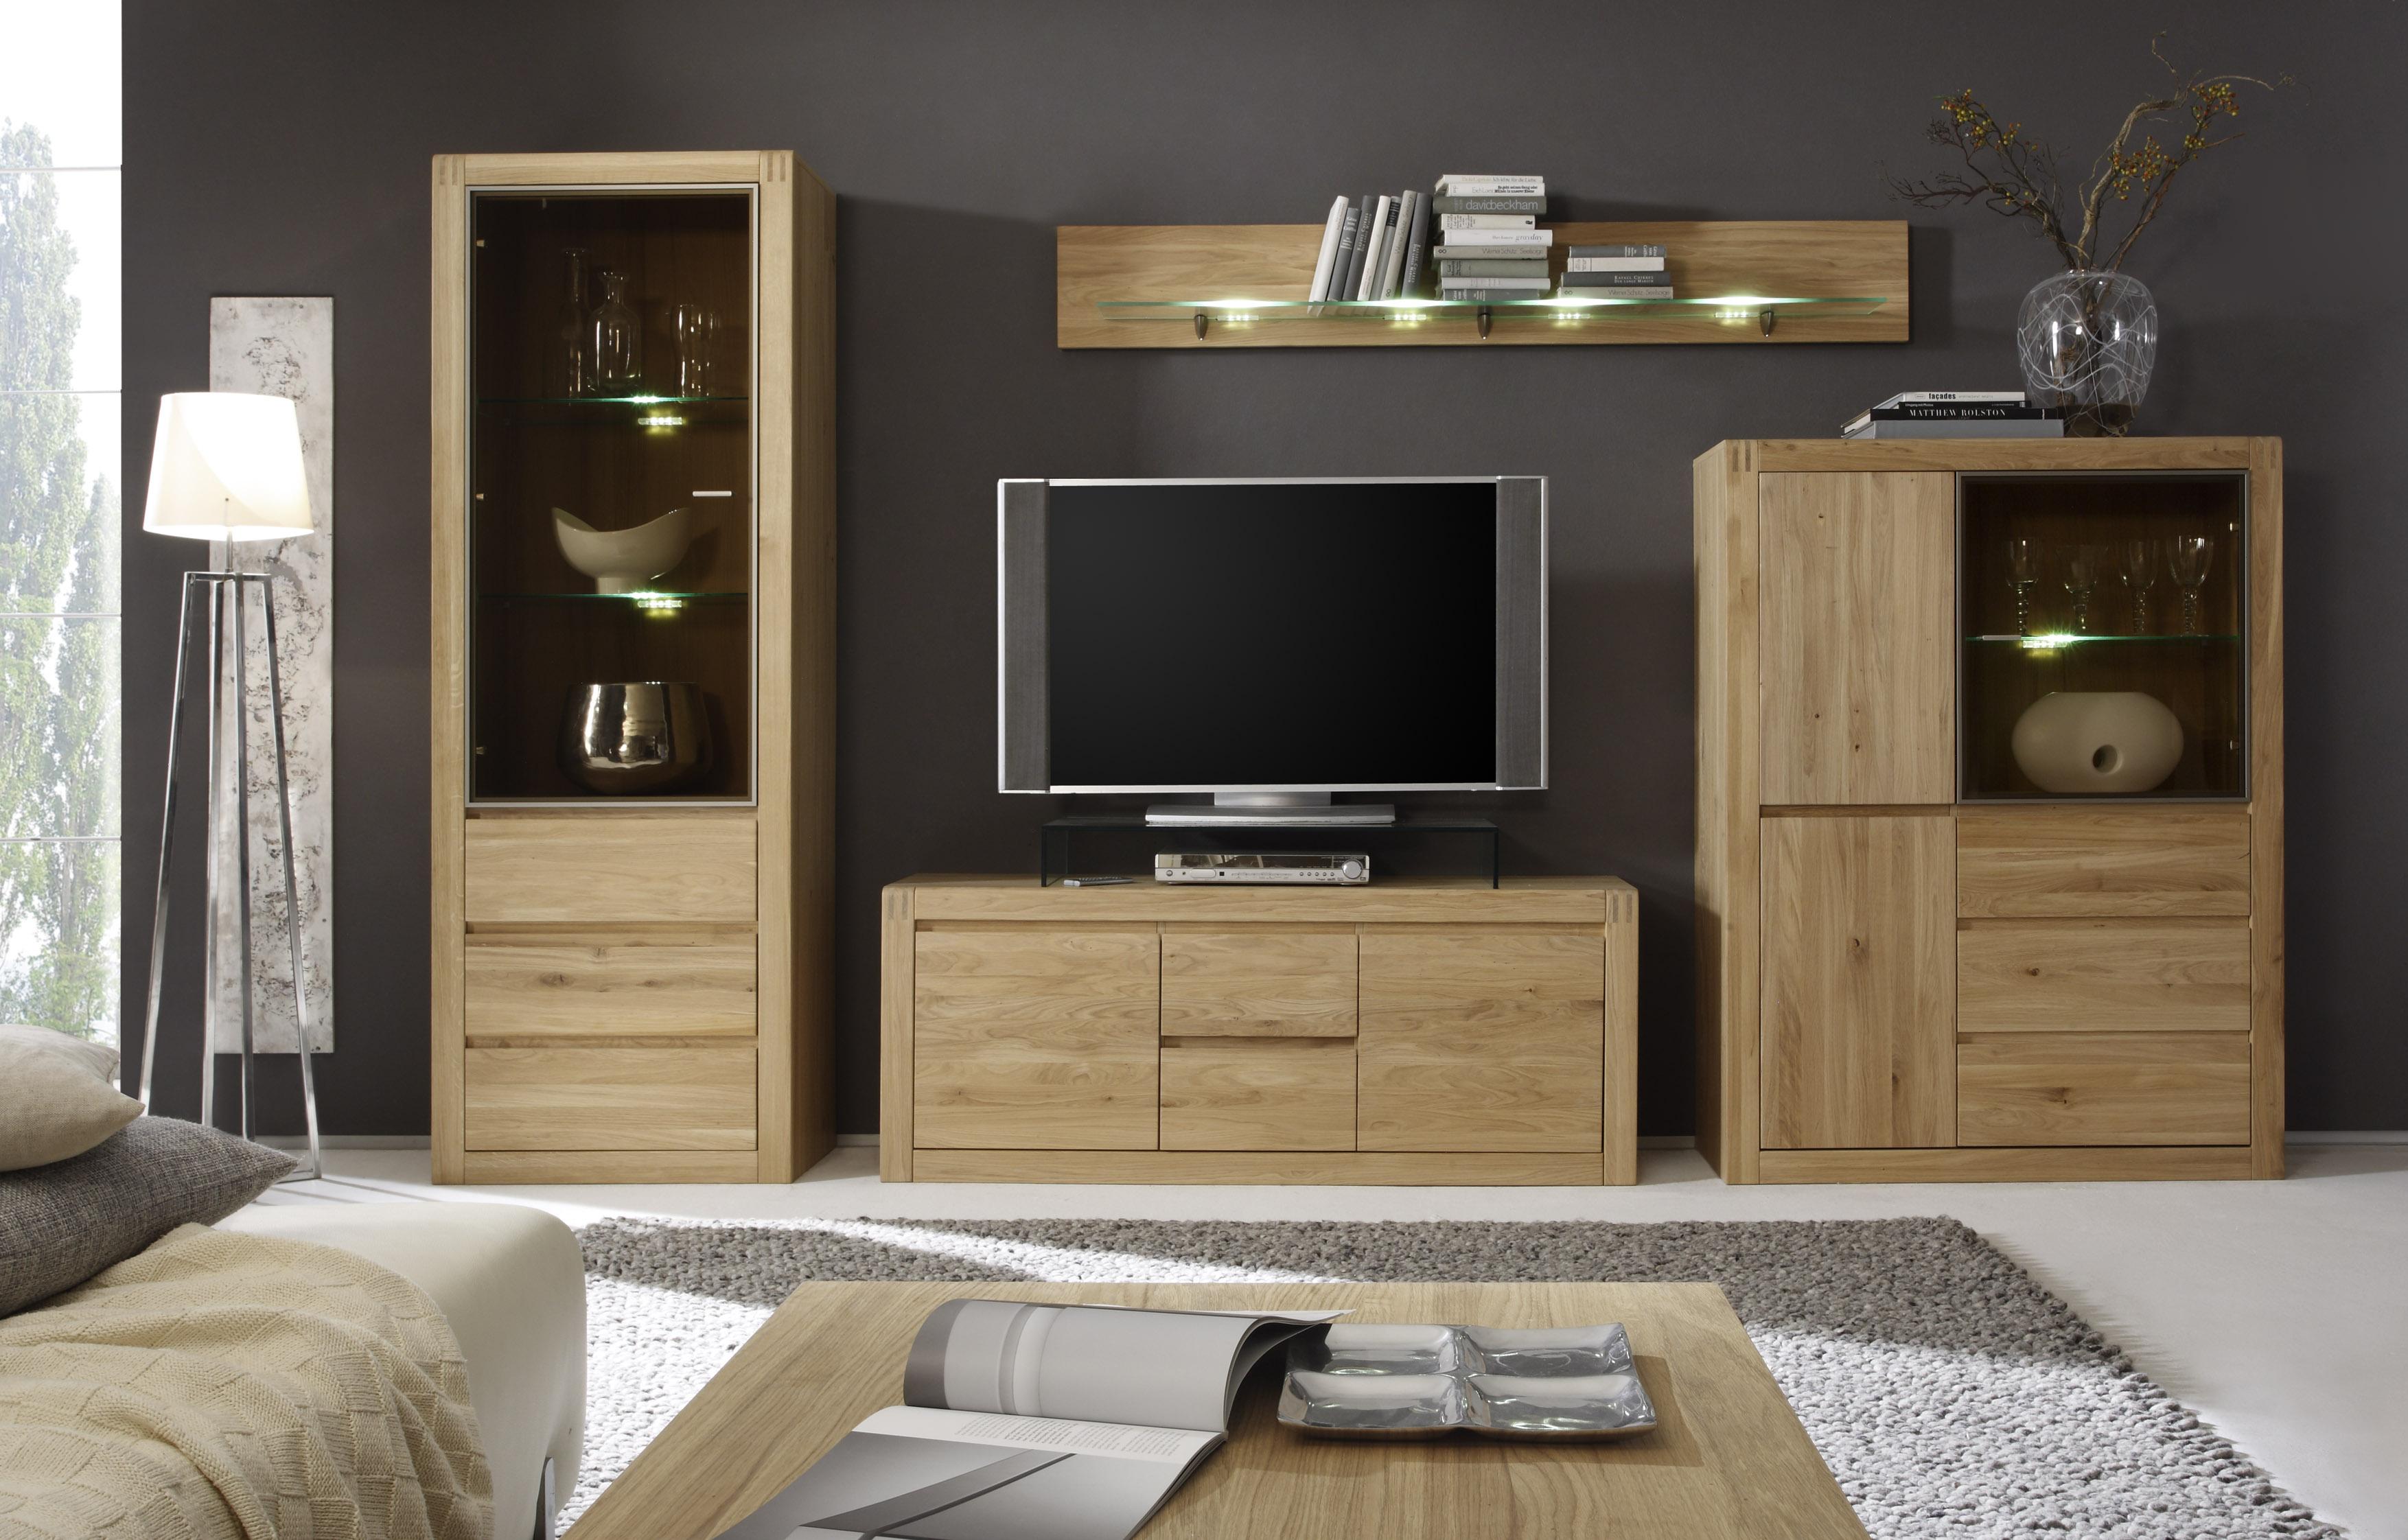 kerkhoff wohnwand ponto v in eiche biano oder kernbuche. Black Bedroom Furniture Sets. Home Design Ideas